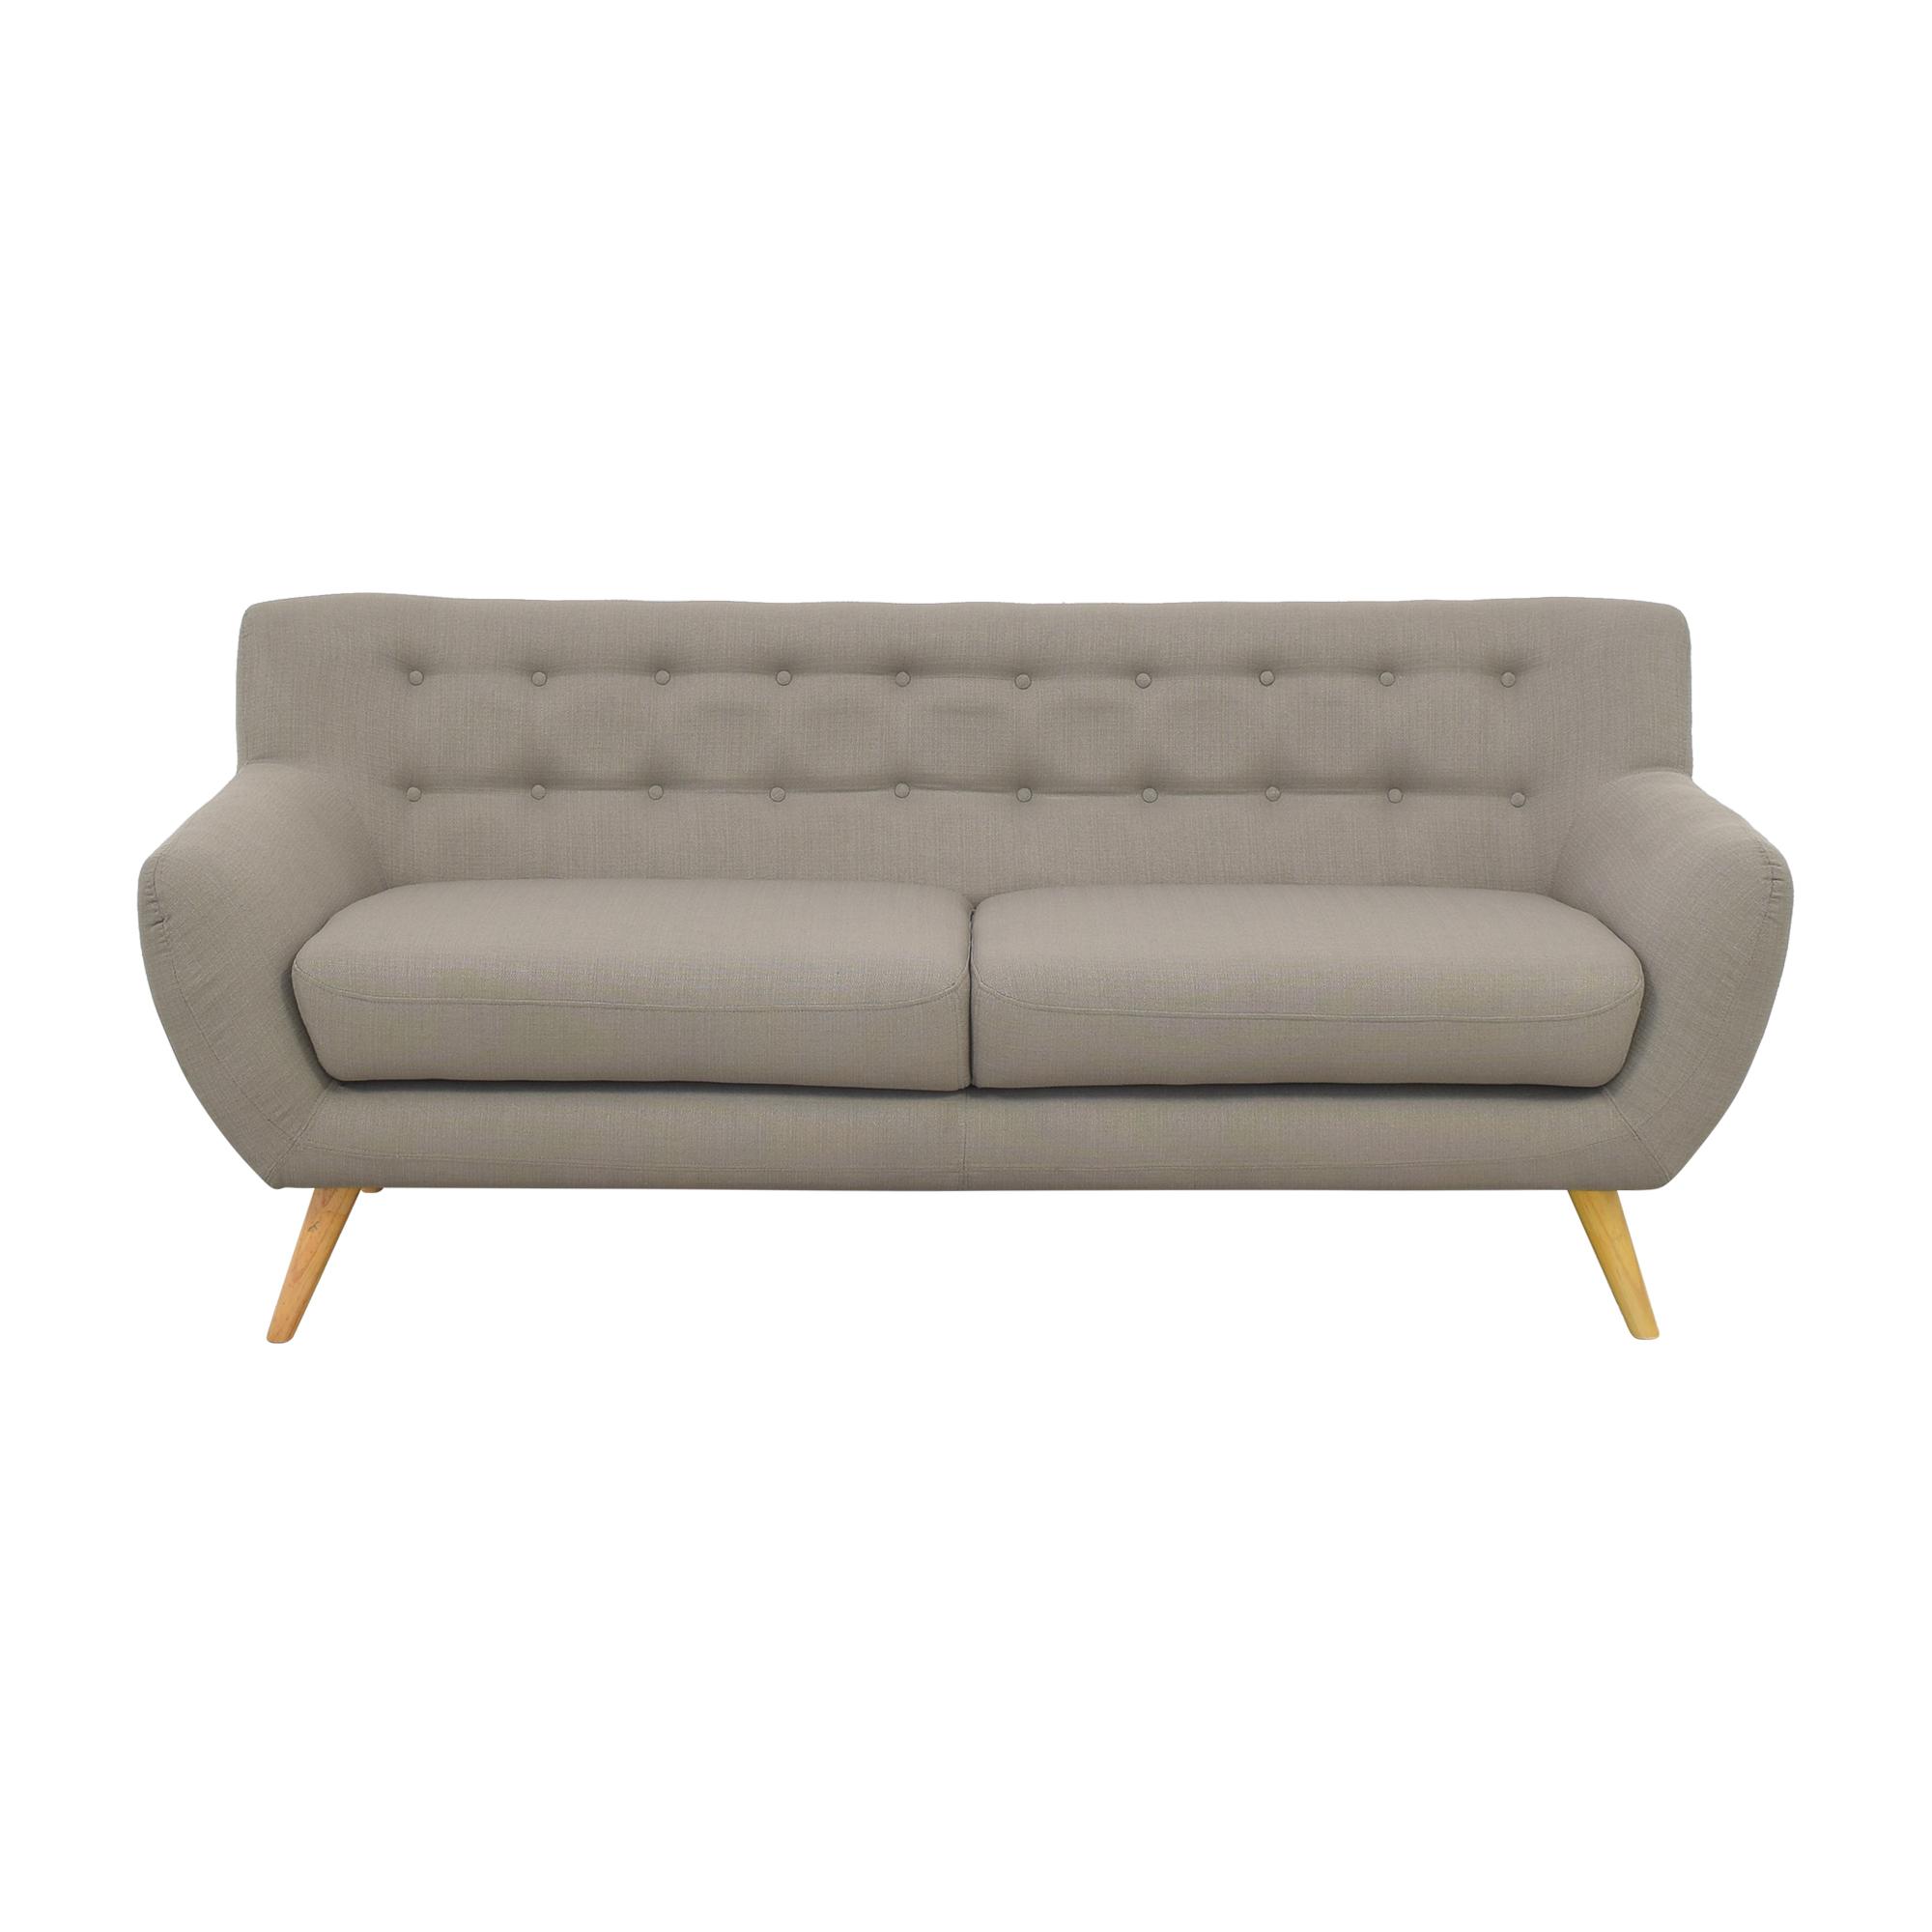 Tufted Two Cushion Sofa coupon